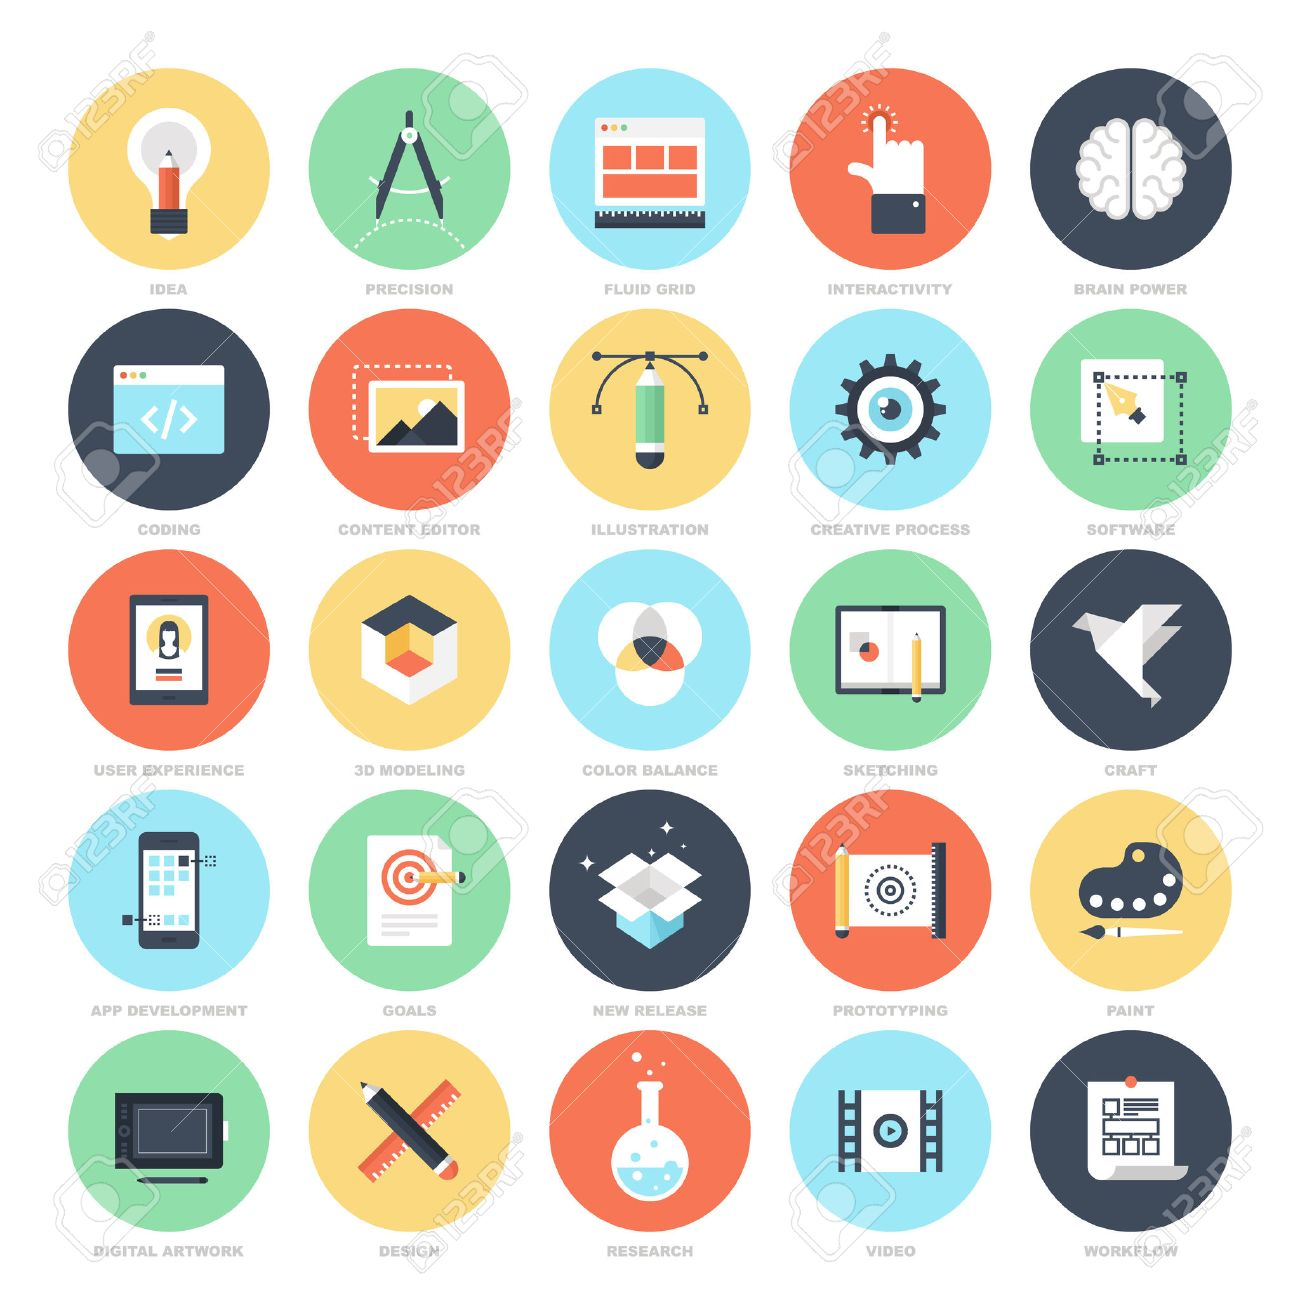 creative process icons